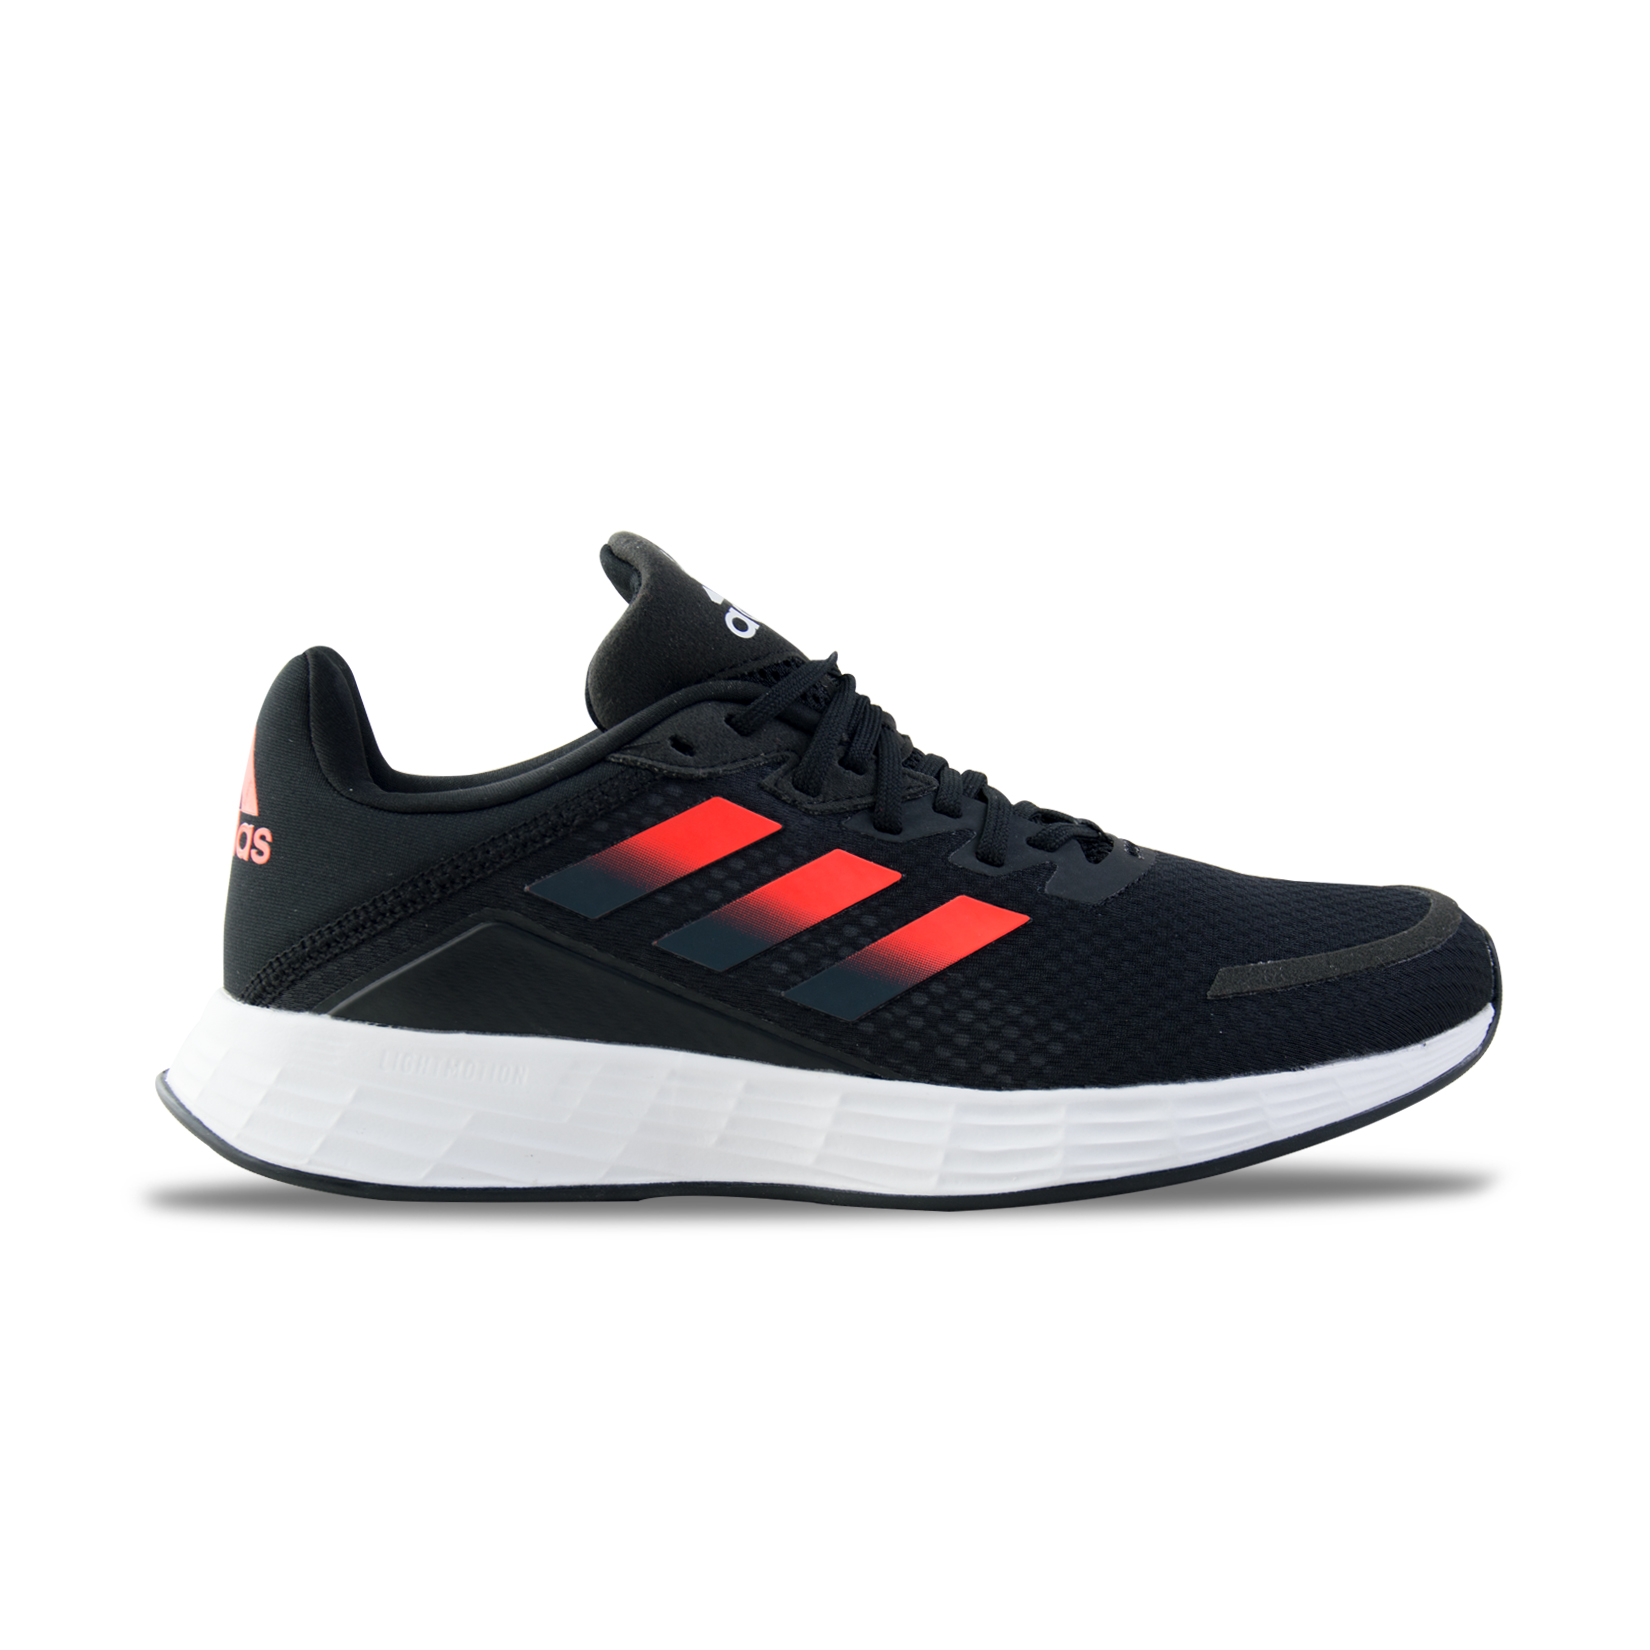 Adidas Performance Duramo Sl Black - Red